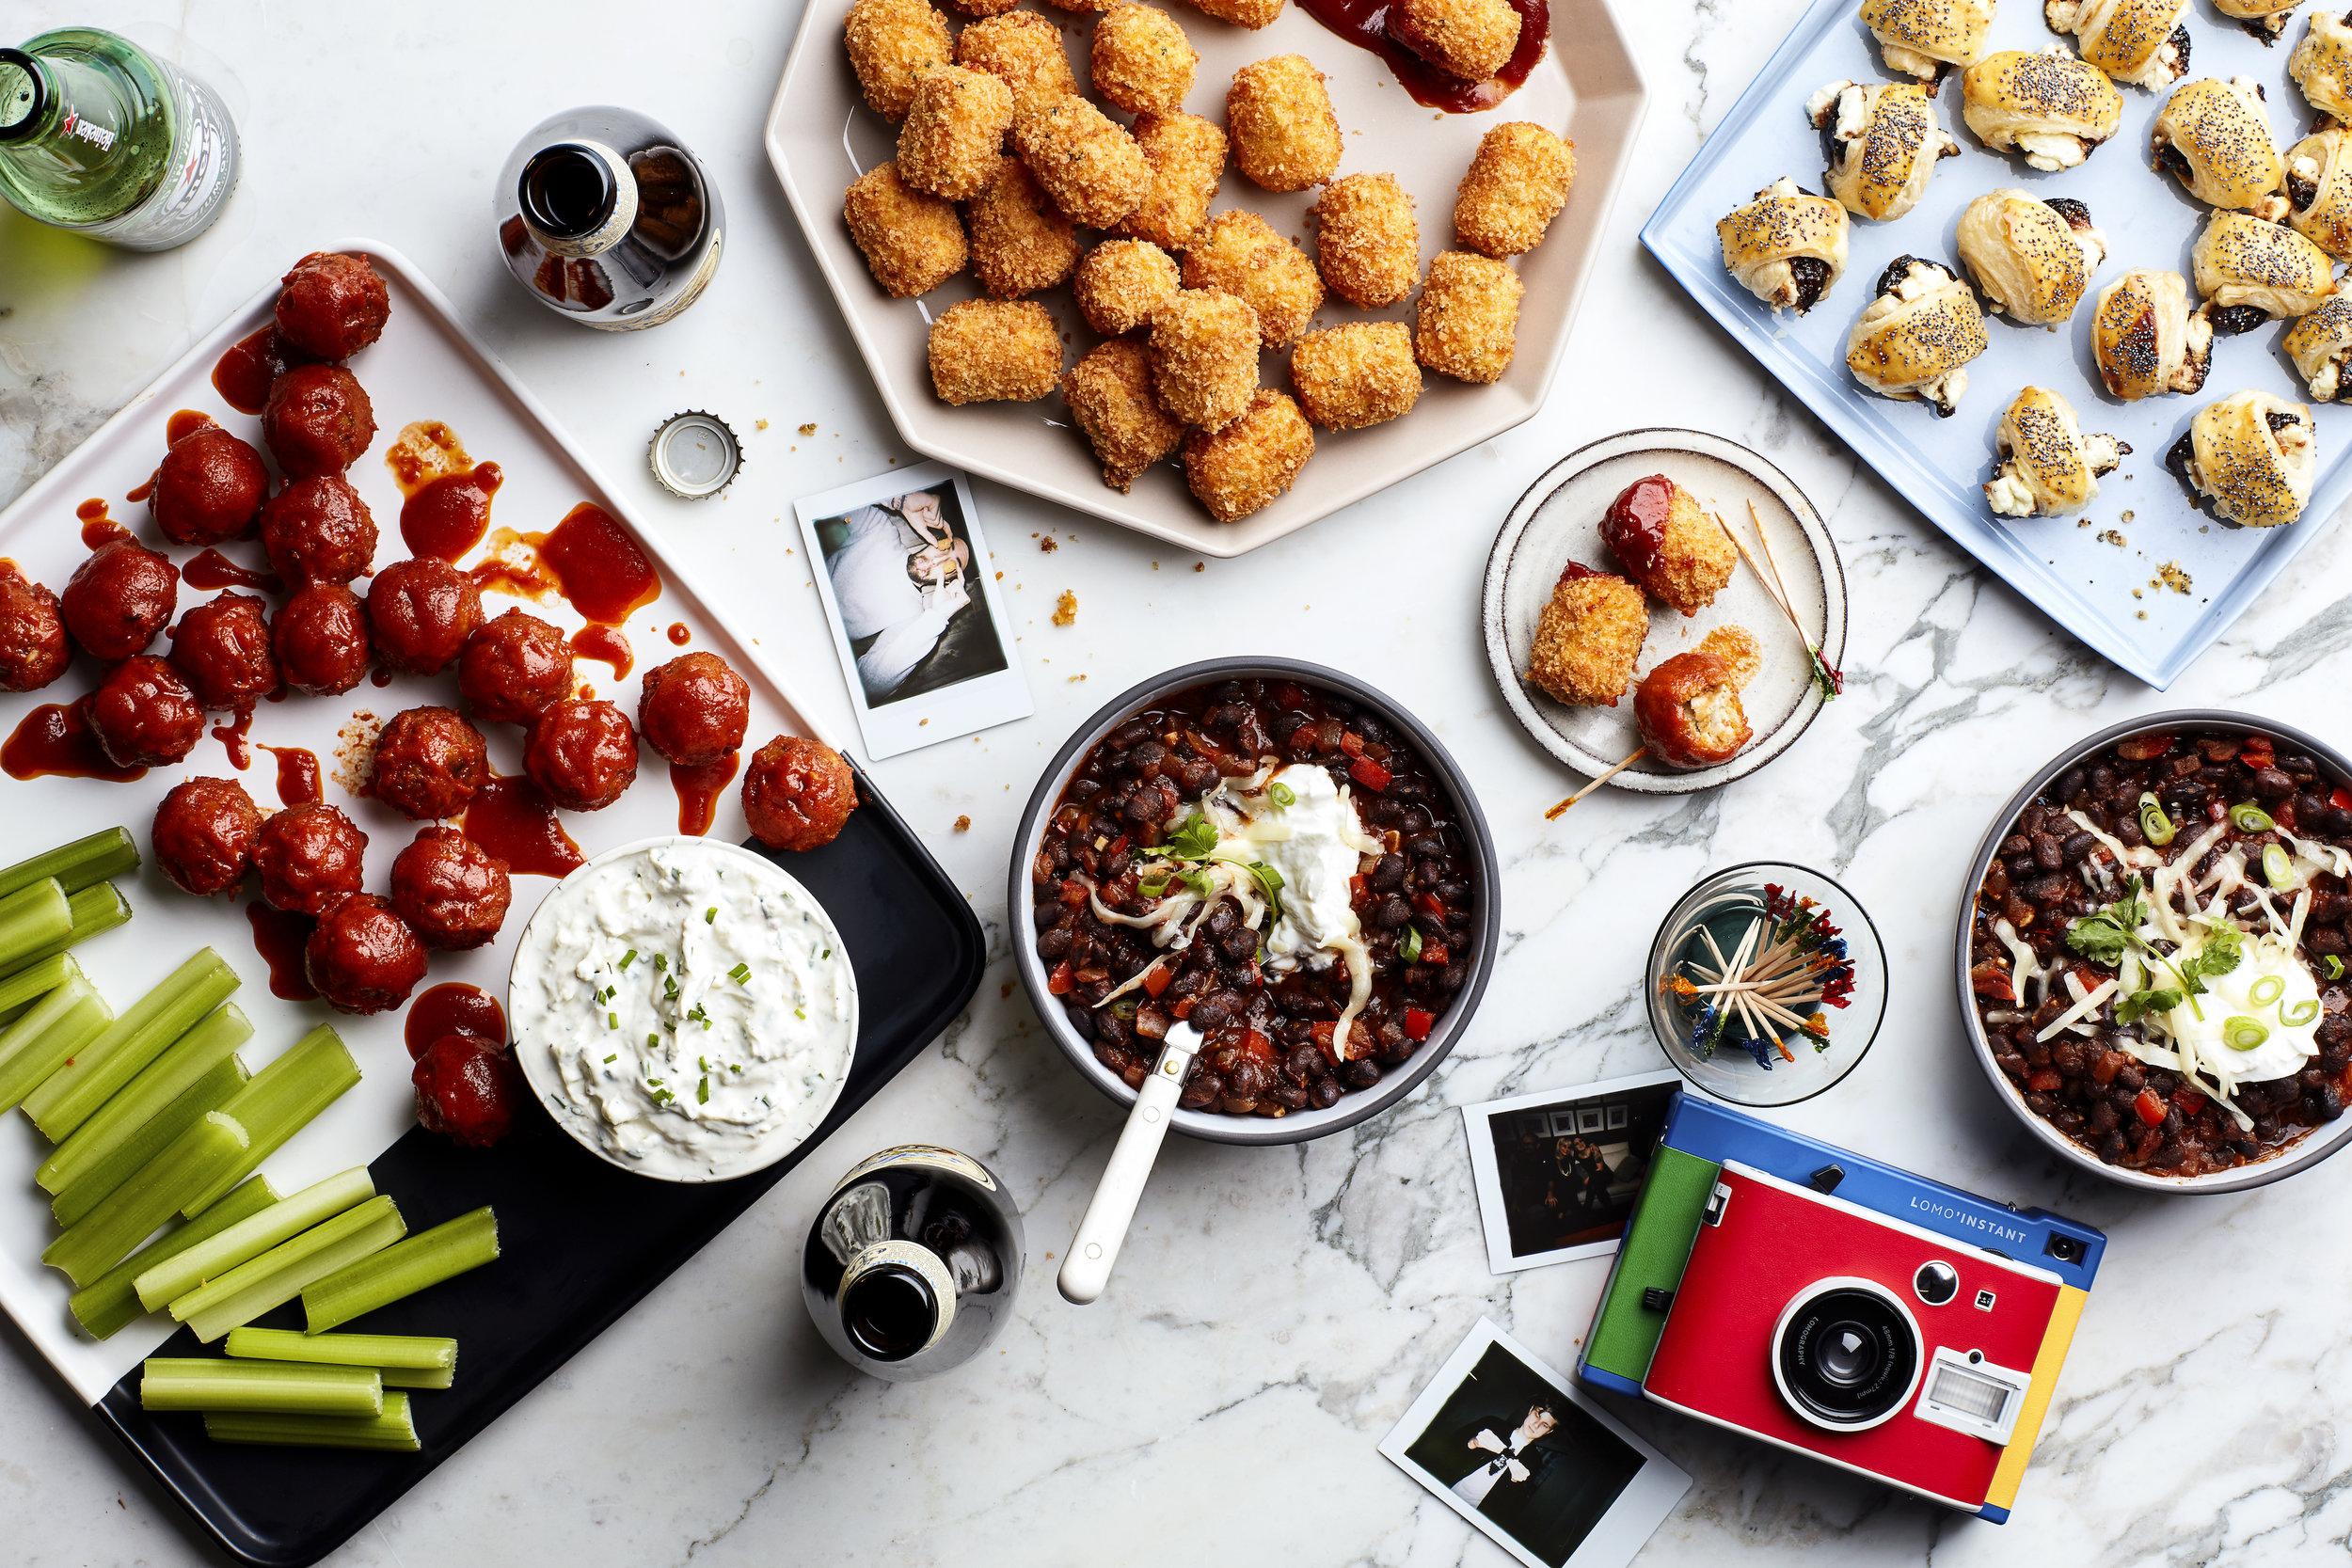 vegetarian-superbowl-menu-hero-20012017.jpg